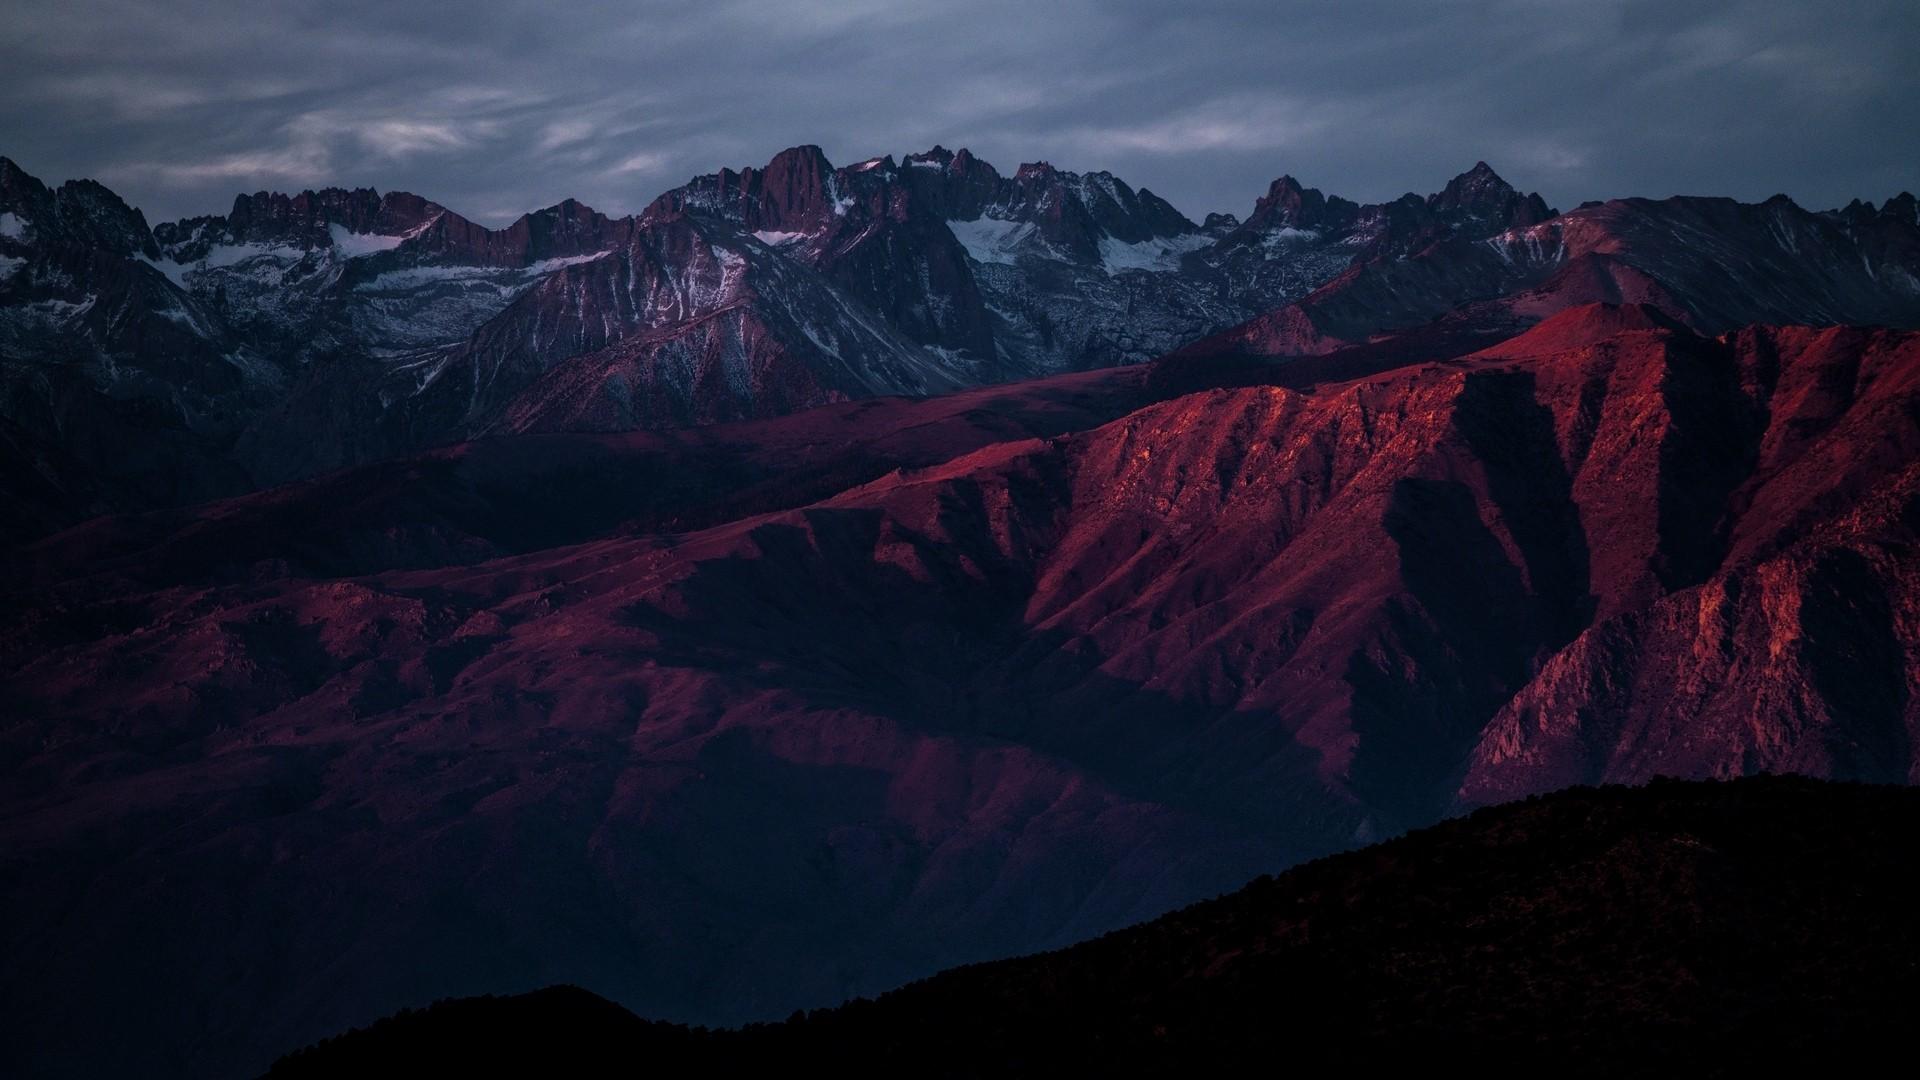 Dark Mountain wallpaper